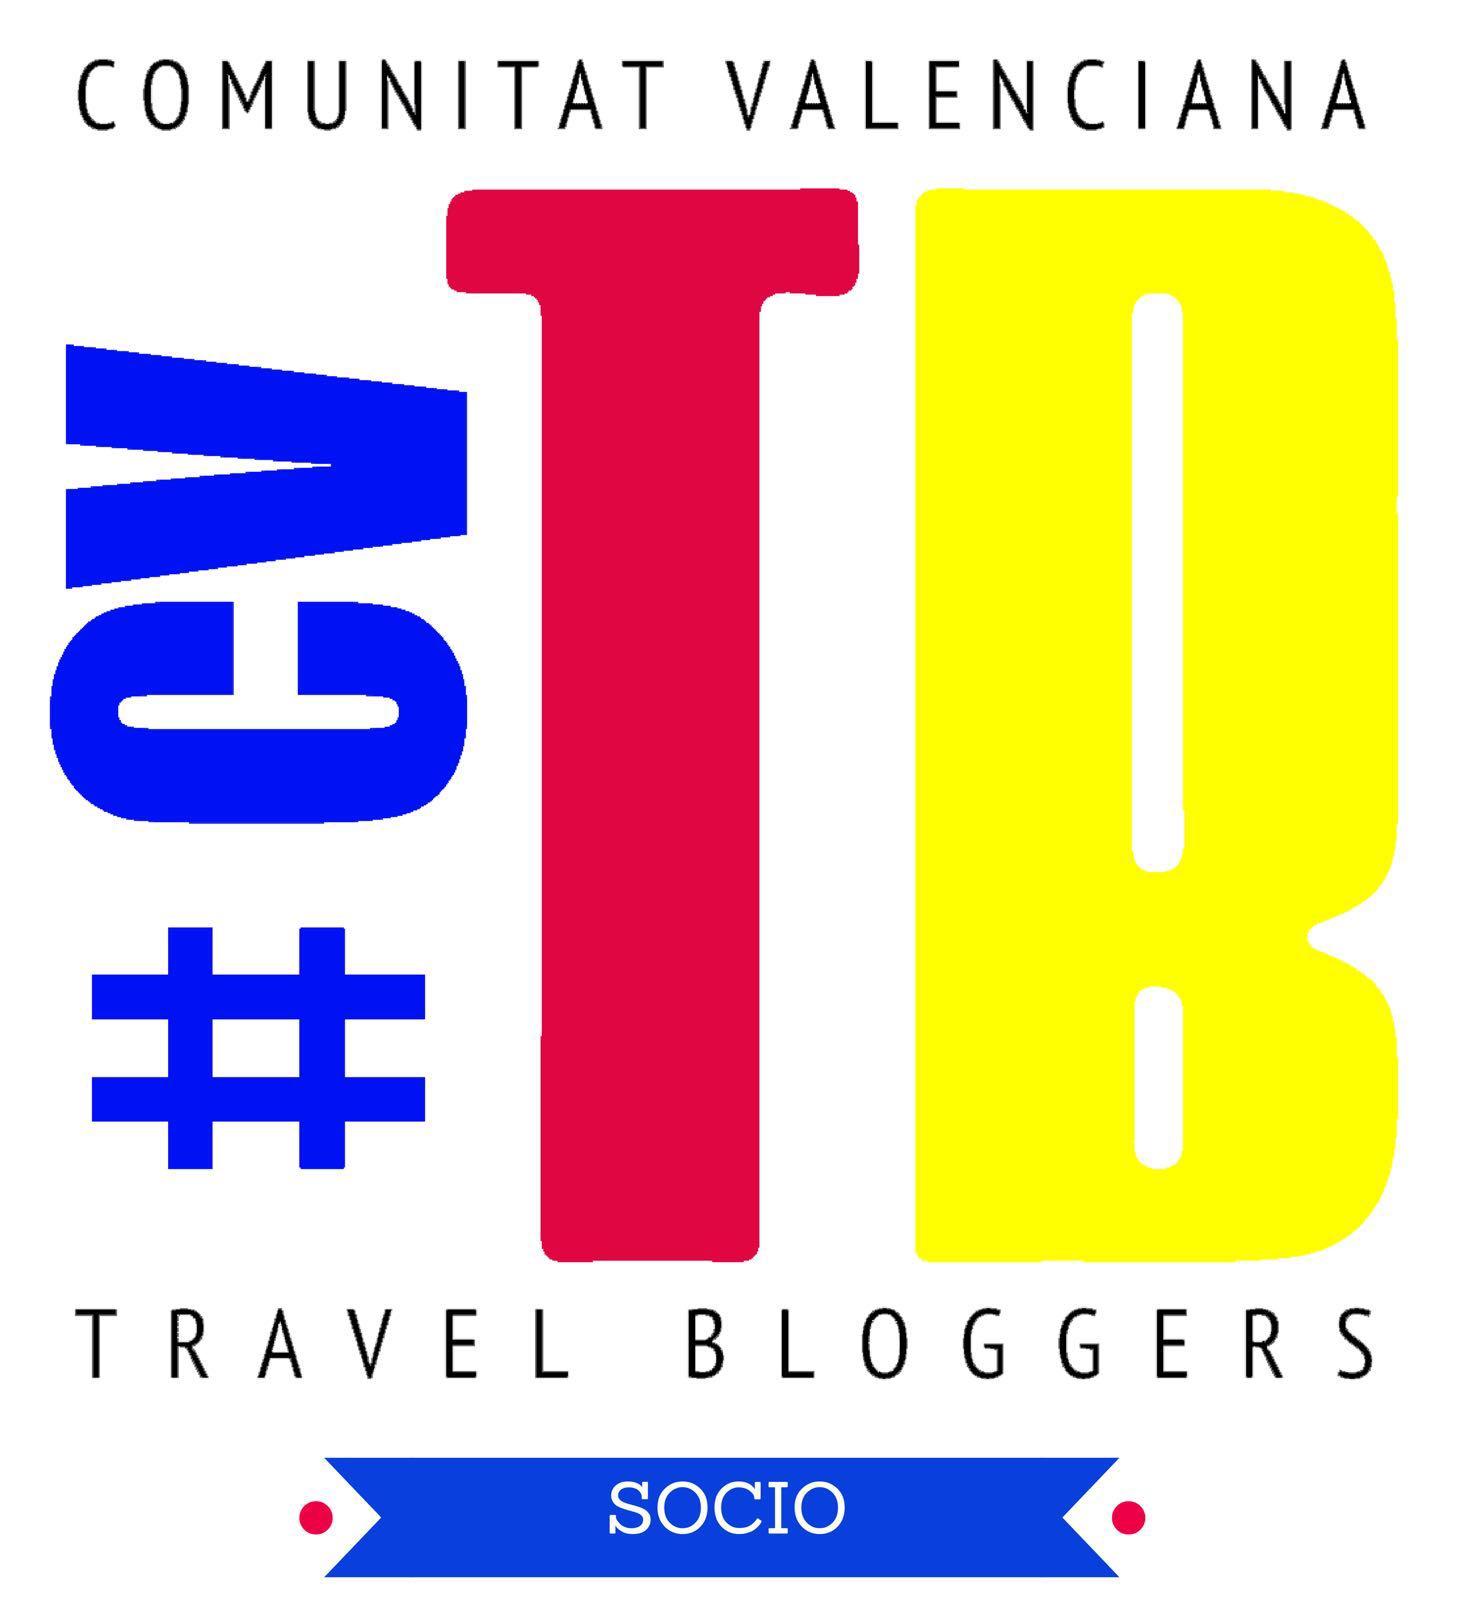 ASOCIADO C. VALENCIANA TRAVEL BLOGGERS